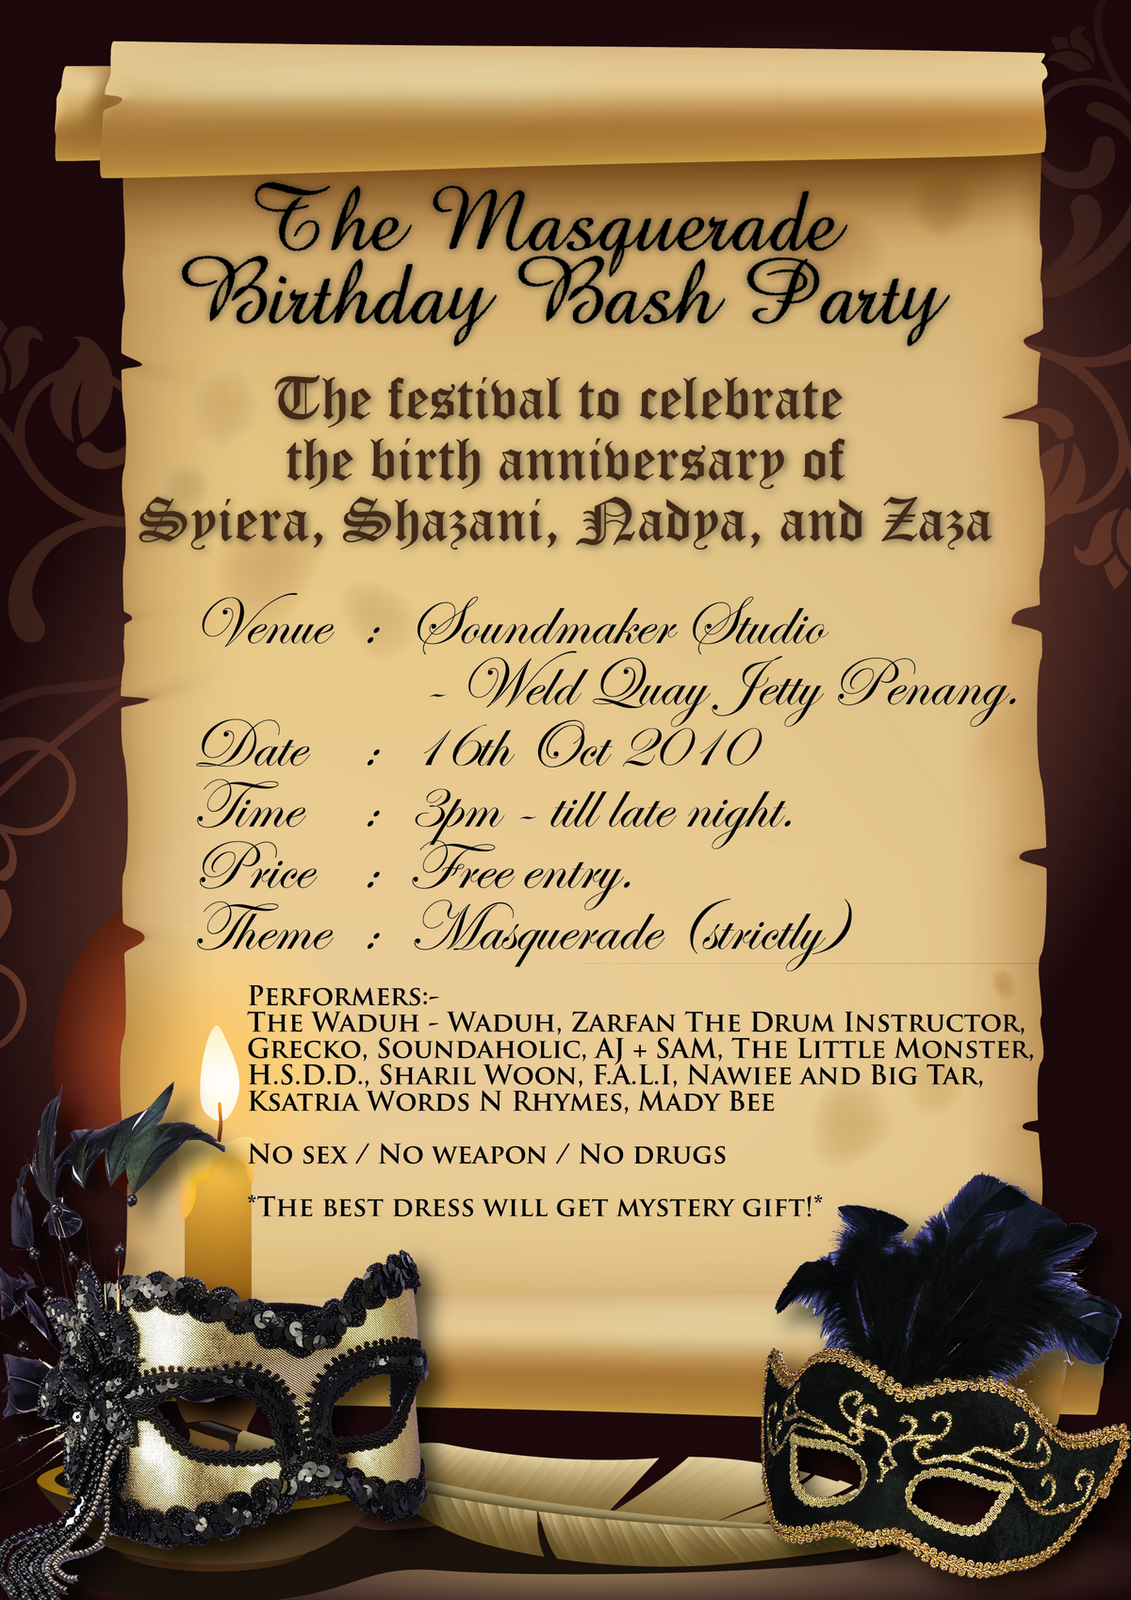 masquerade party decorating ideas | The Masquerade Birthday Bash ...